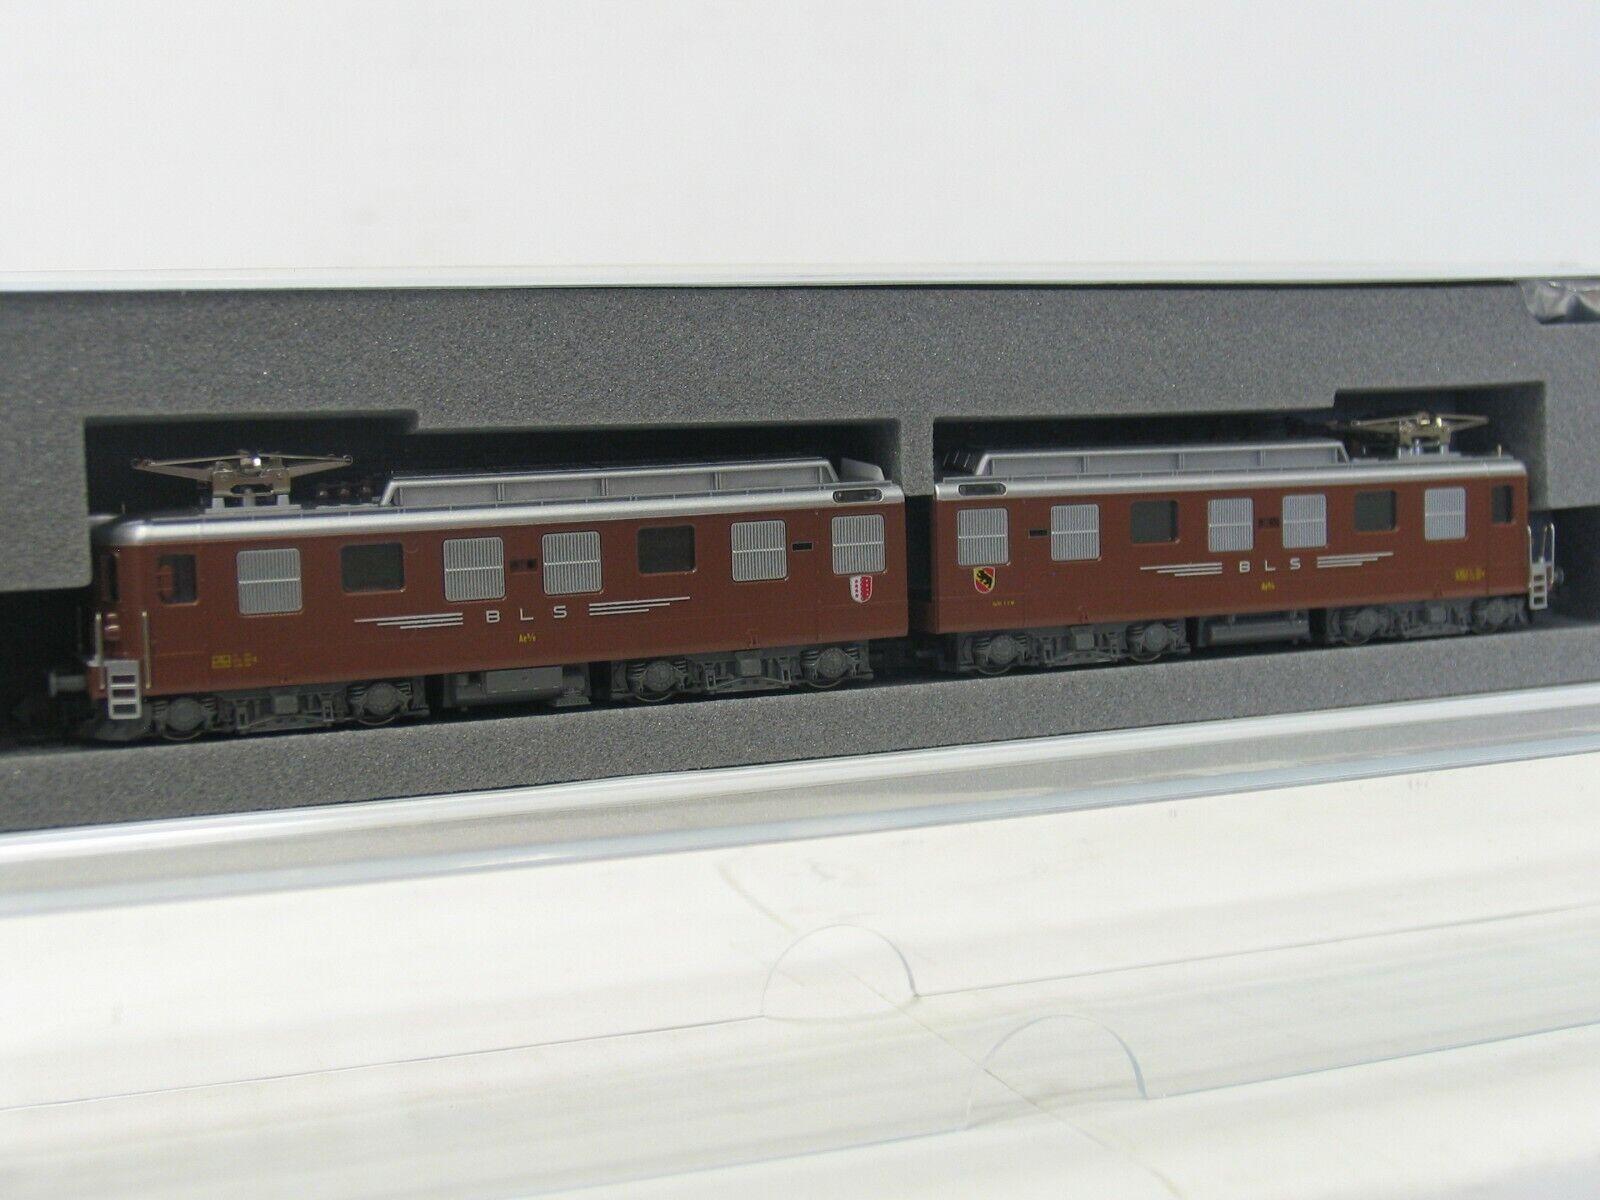 alta calidad general Kato Kato Kato 10601 doble-e-Lok AE 8 8 marrón de la BLS nh208  calidad oficial